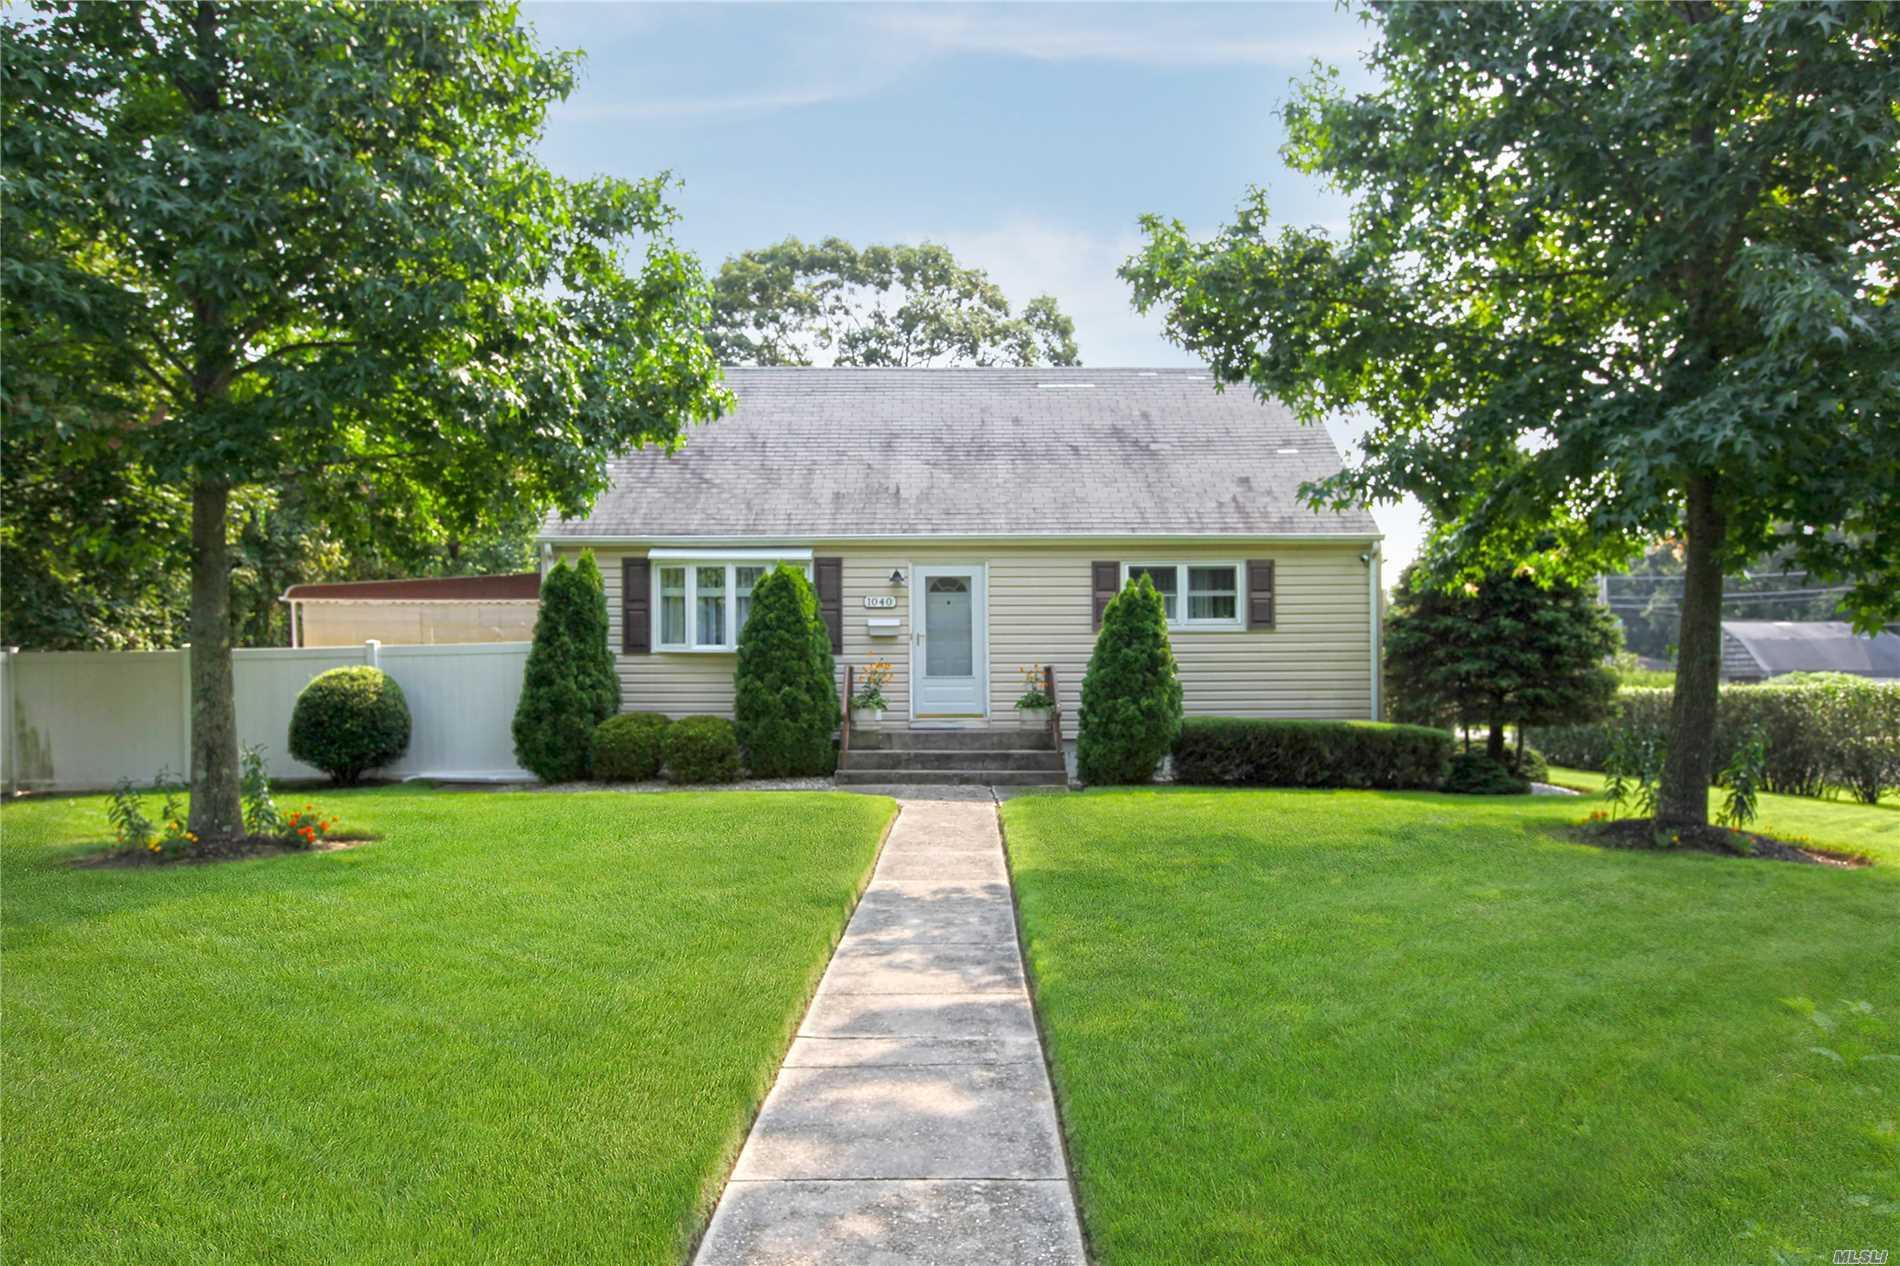 1040 Howells Rd - Bay Shore, New York